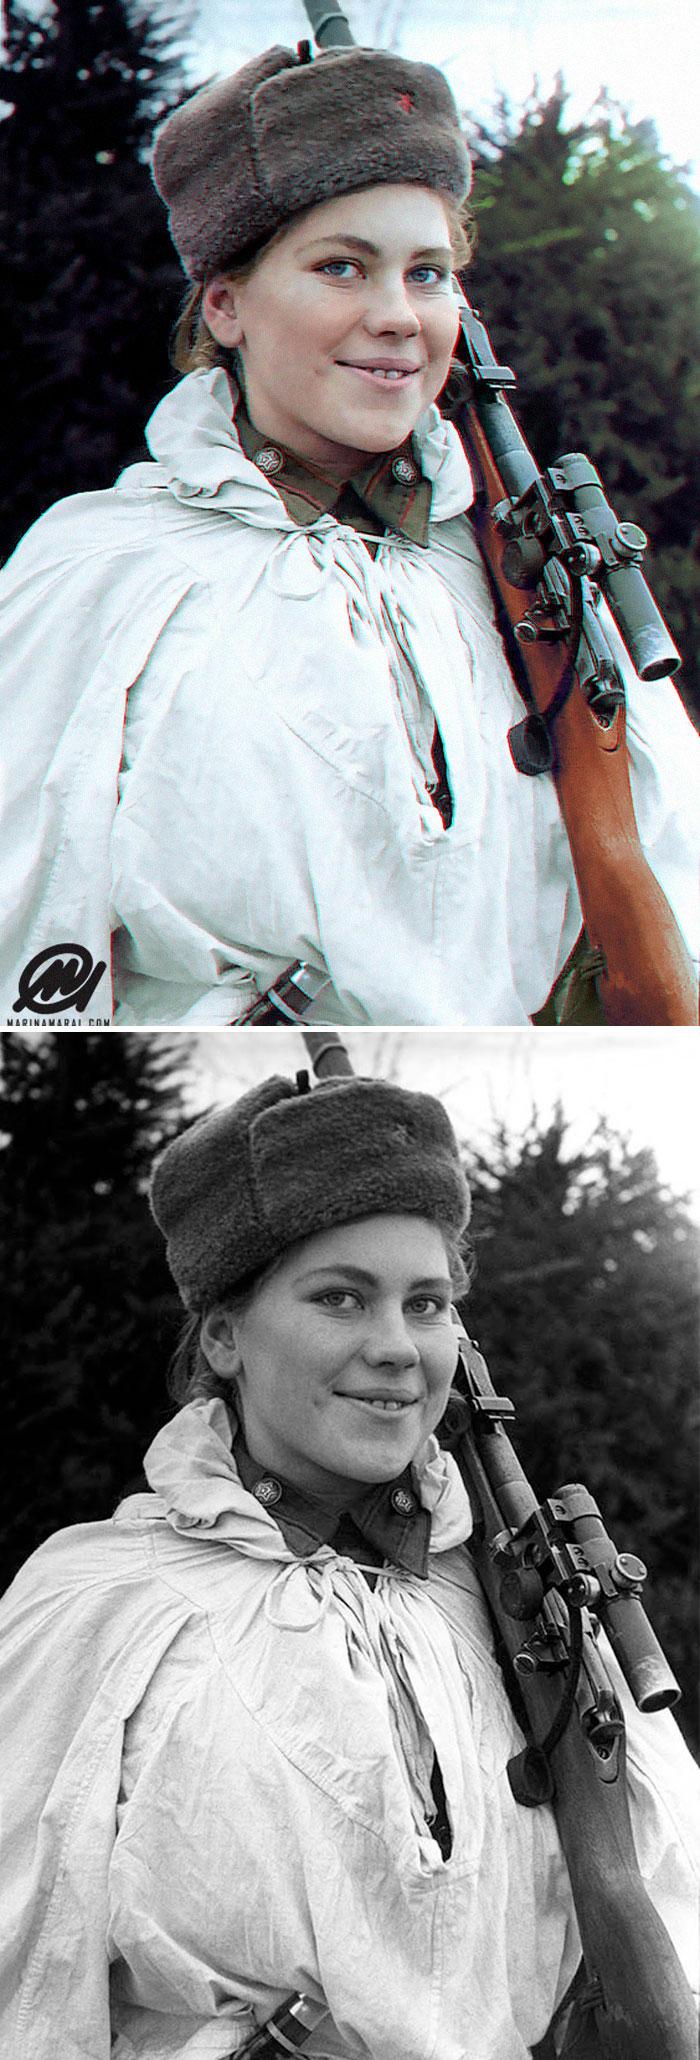 Roza Shanina, un francotirador ruso de la Segunda Guerra Mundial de 19 años con 59 asesinatos confirmados [19659003] </p data-recalc-dims=